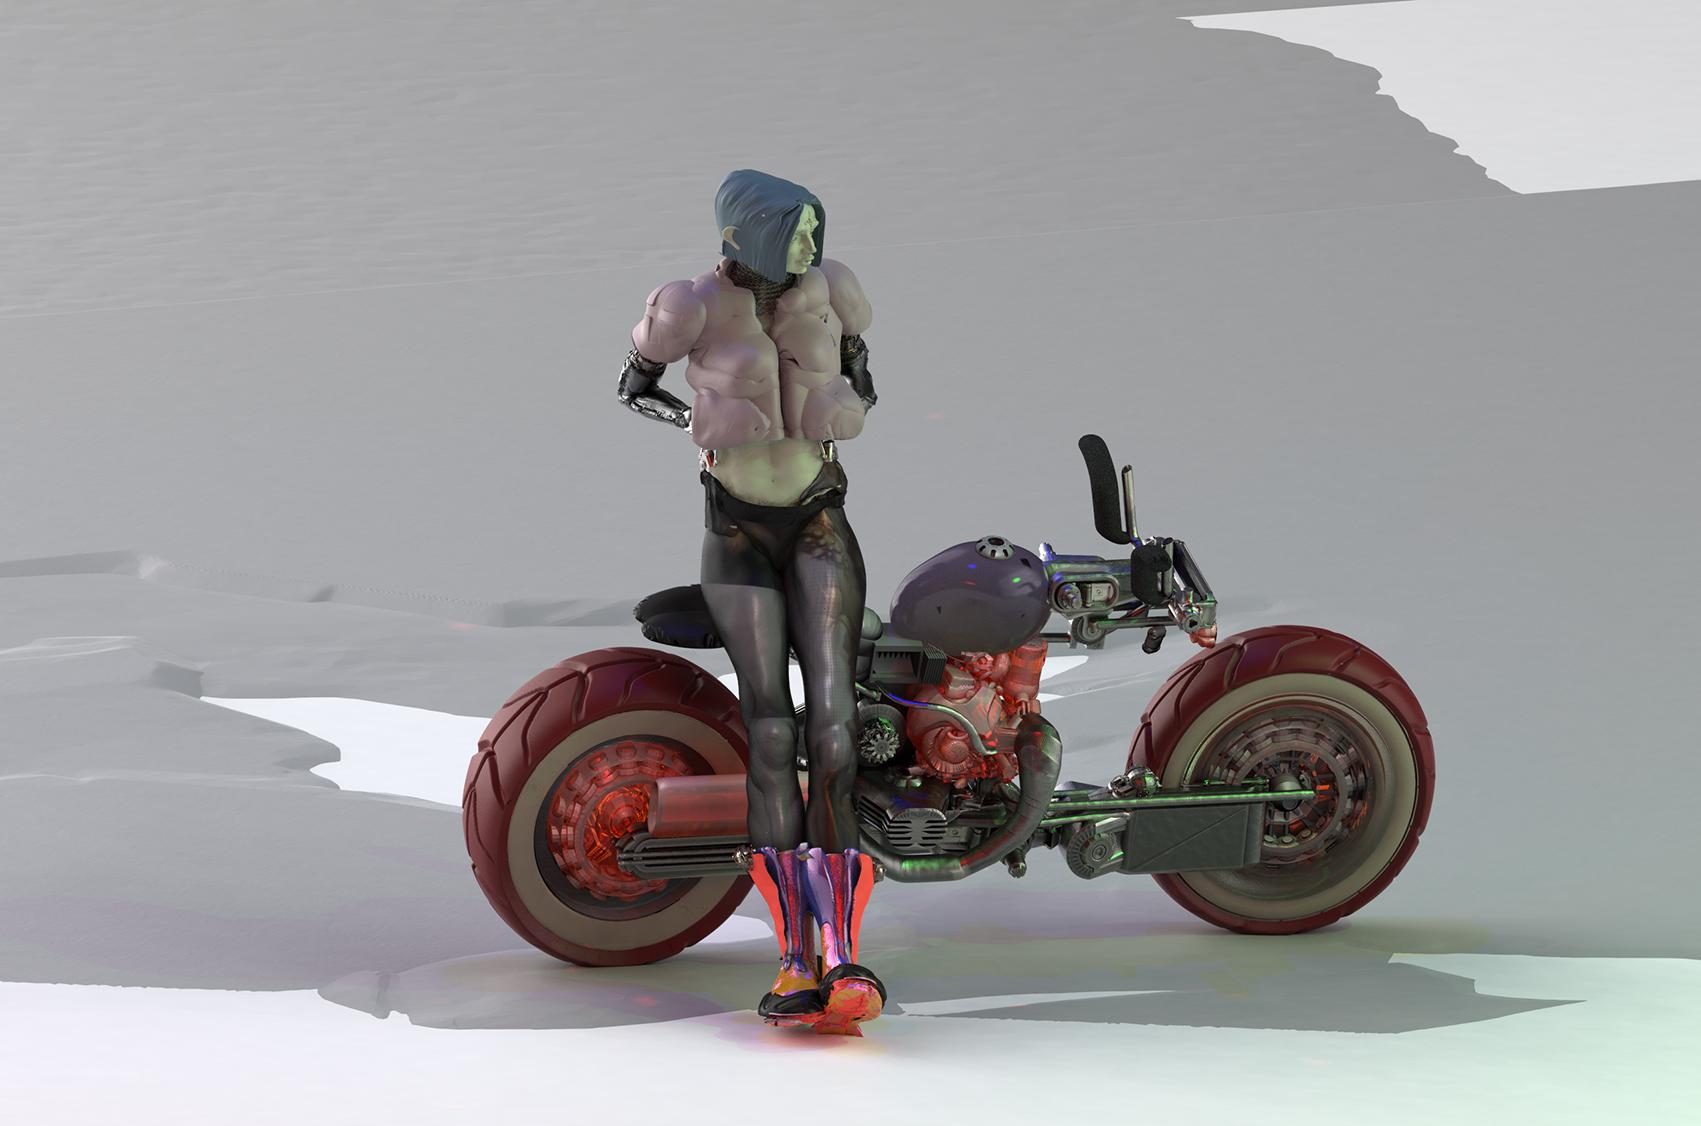 Max+Brazier-Jones+biker+gal.jpg